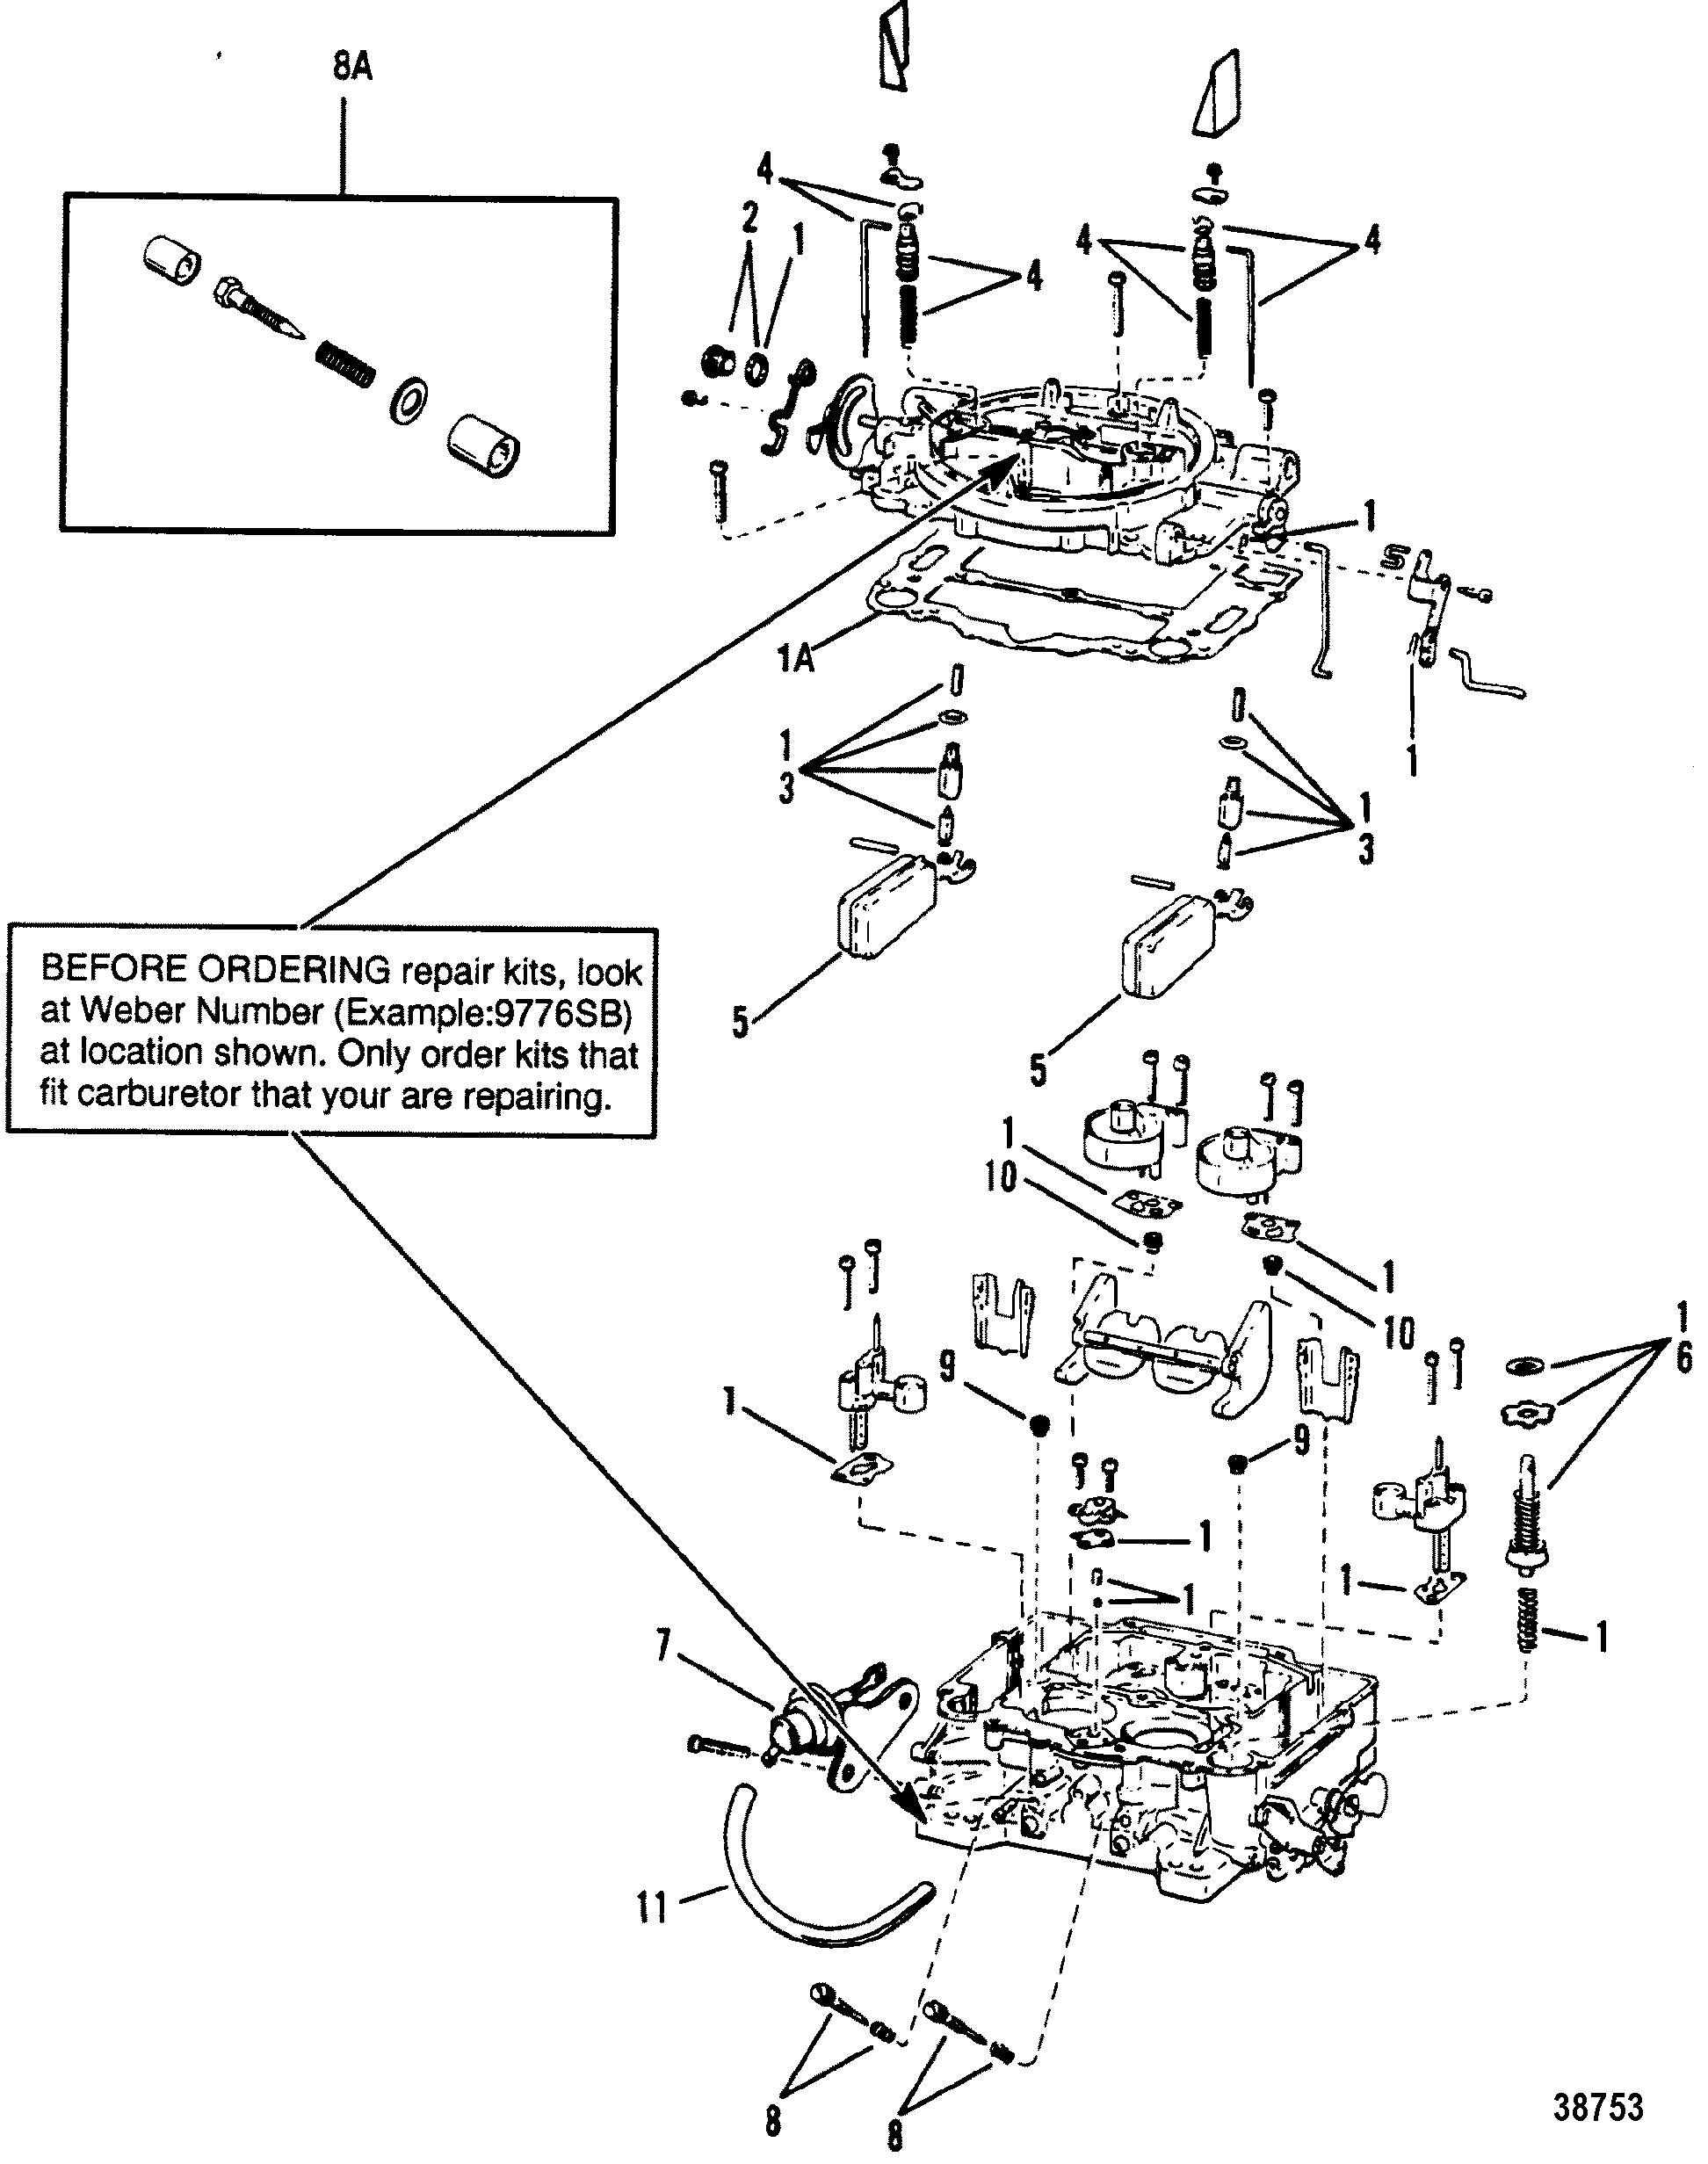 carburetor weber for mercruiser 4 3l 4 3lx alpha one engine 262 cid rebuilt mercruiser 4.3 engine carburetor(weber) for mercruiser 4 3l 4 3lx alpha one engine (262 cid) gen ii